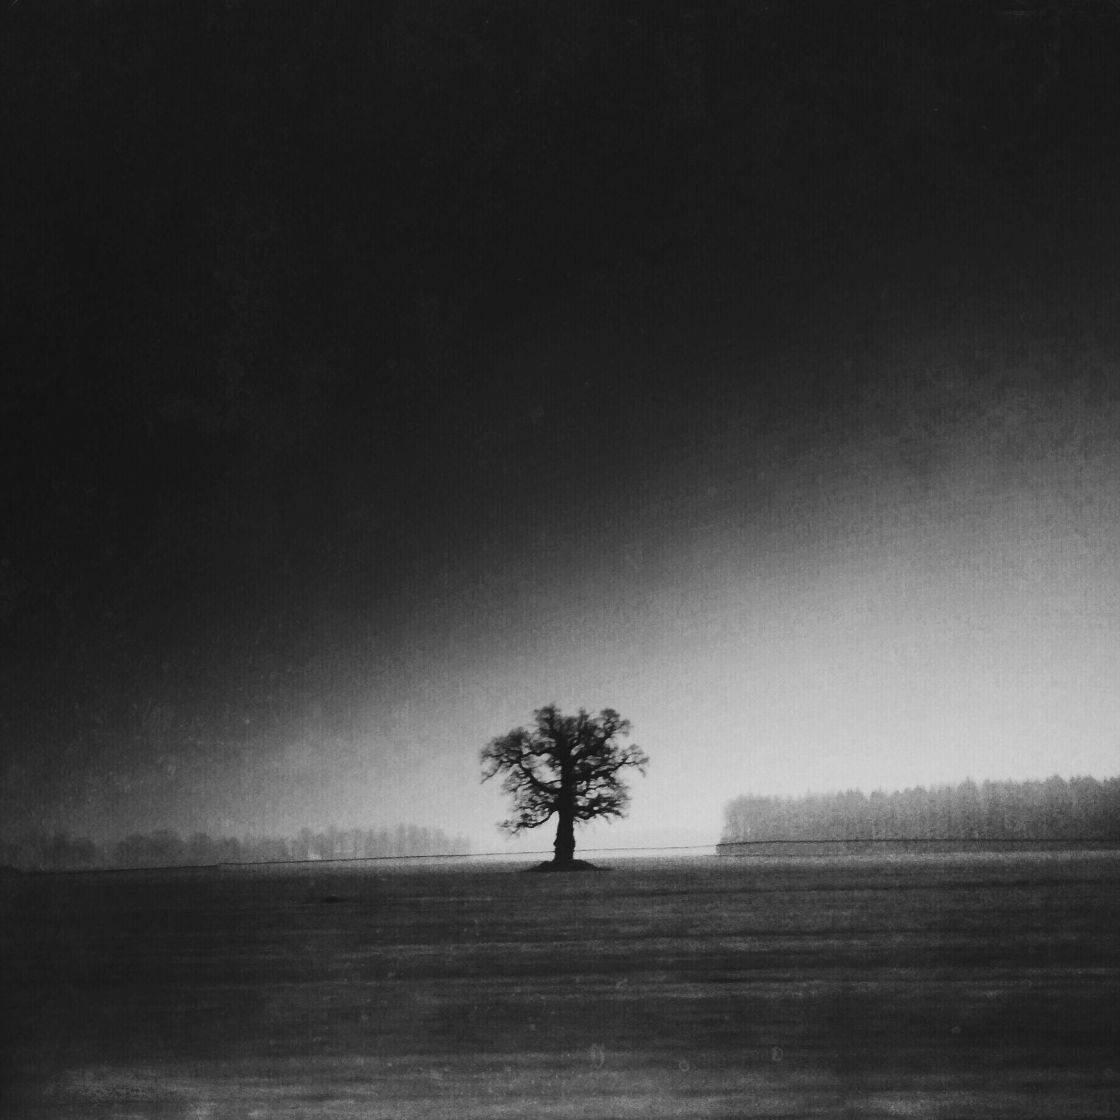 Minimalism Pihone Photography 1 no script